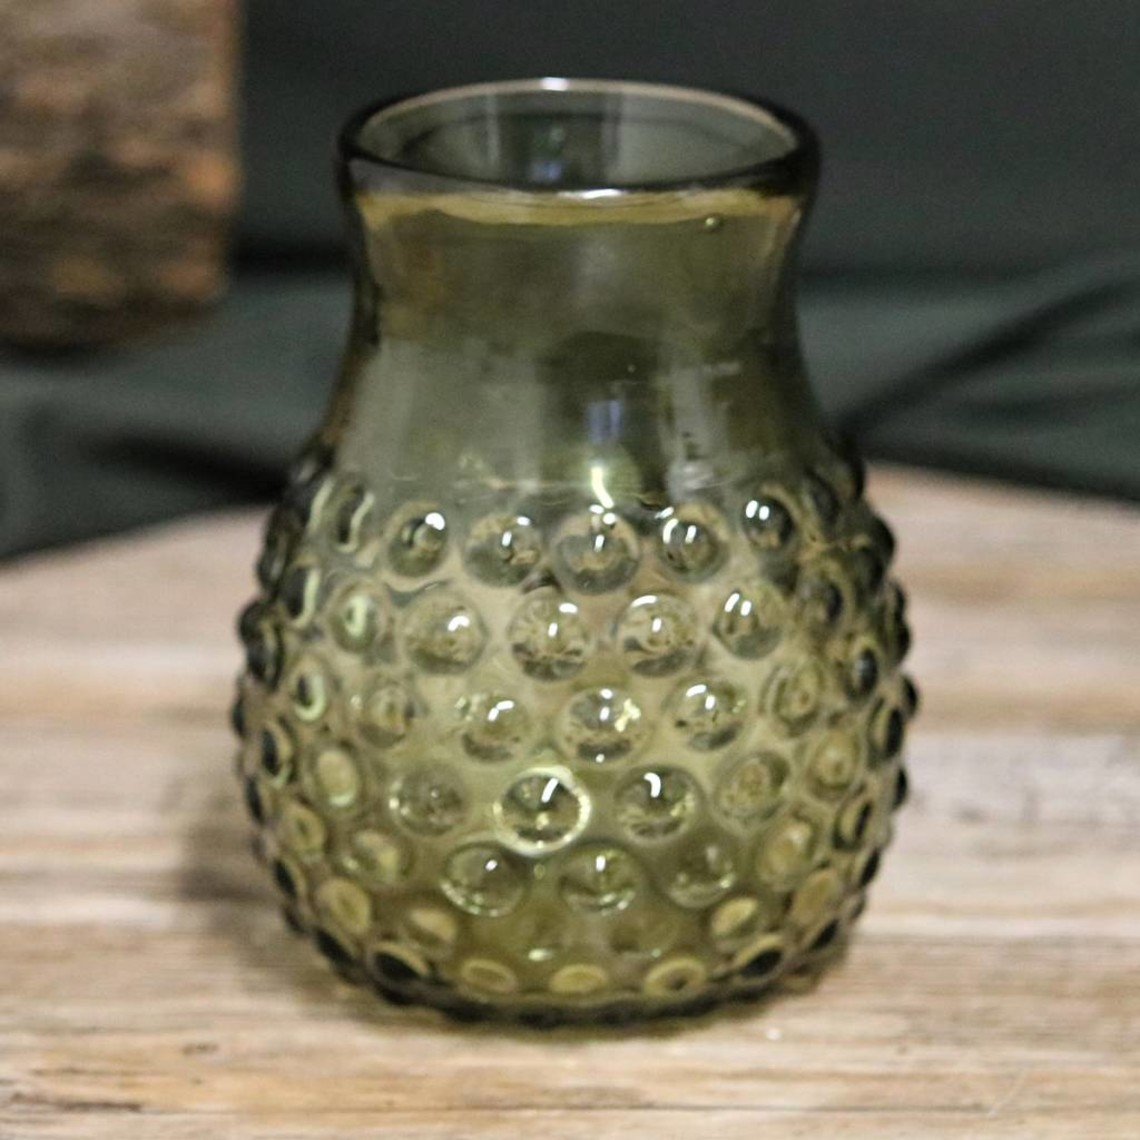 Copa de uva Birka, tumba 539